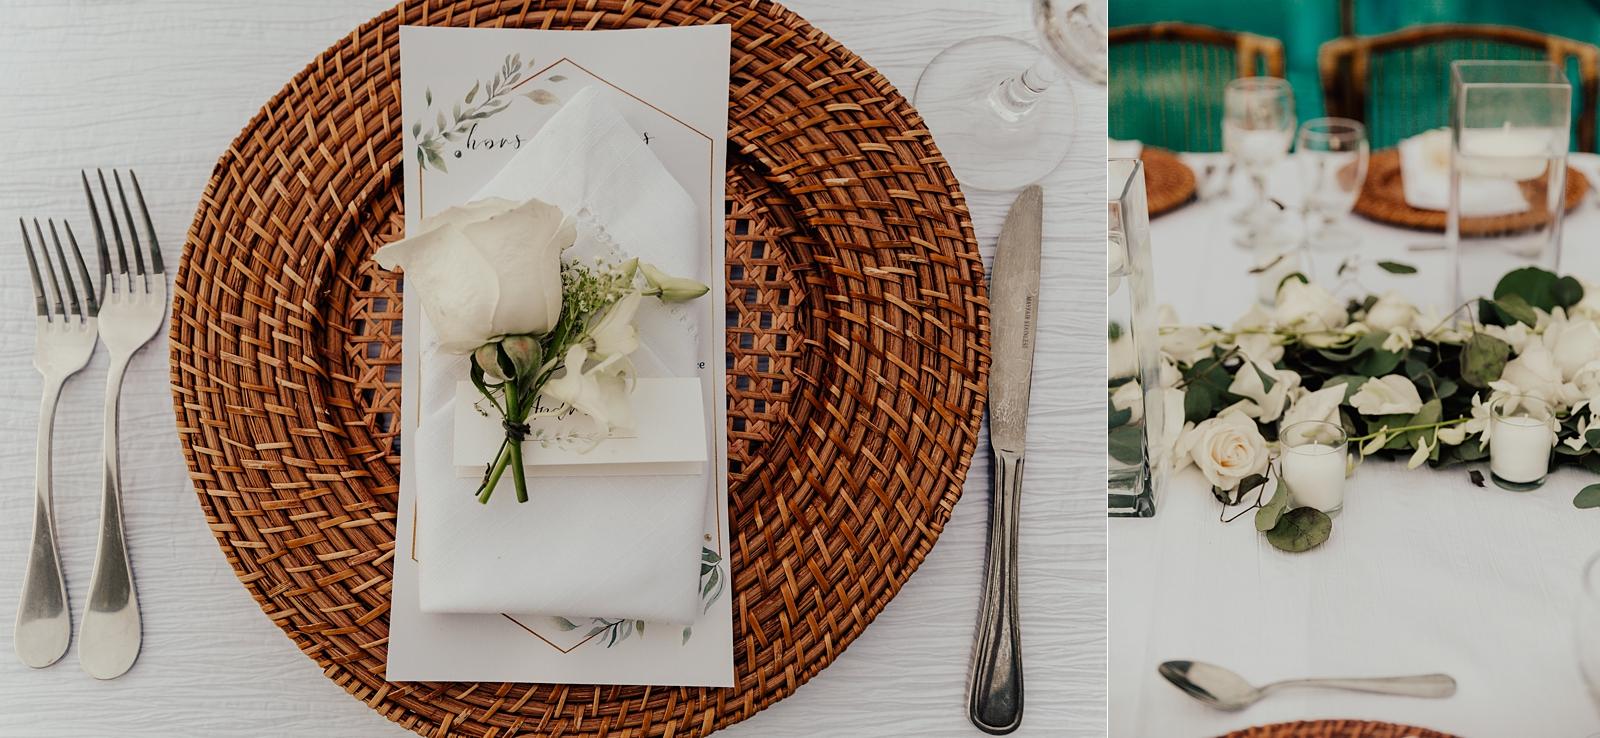 Jenni & Andrew Intimate Beach Destination Wedding in Little Exuma, Bahamas_0518.jpg